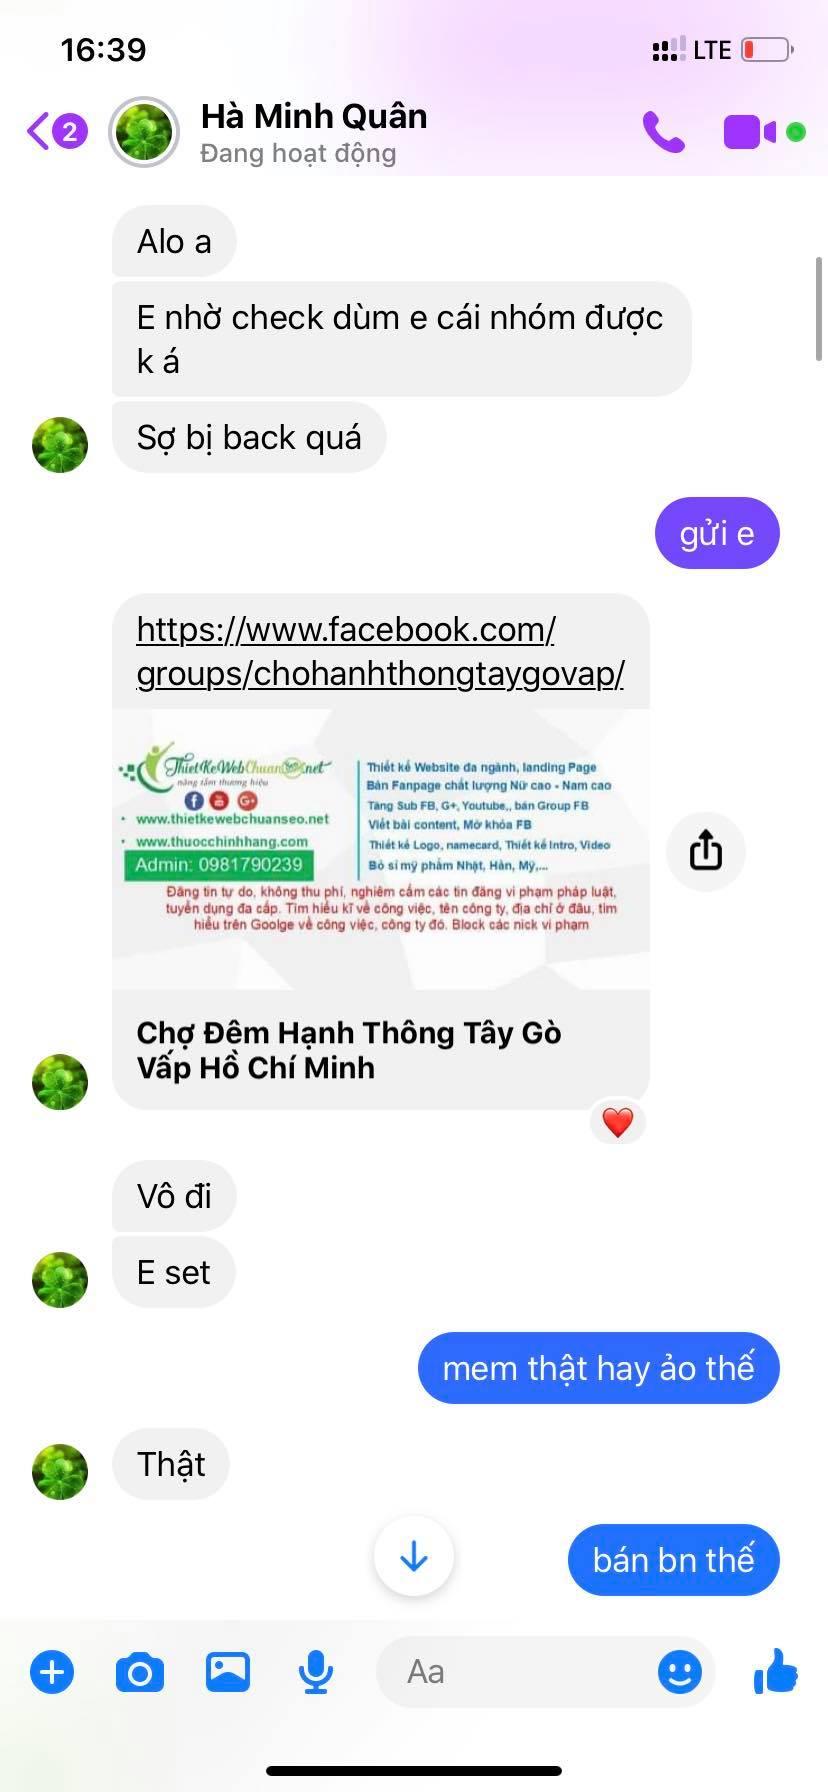 tran-duy-khuong-lua-dao-tren-facebook-fb